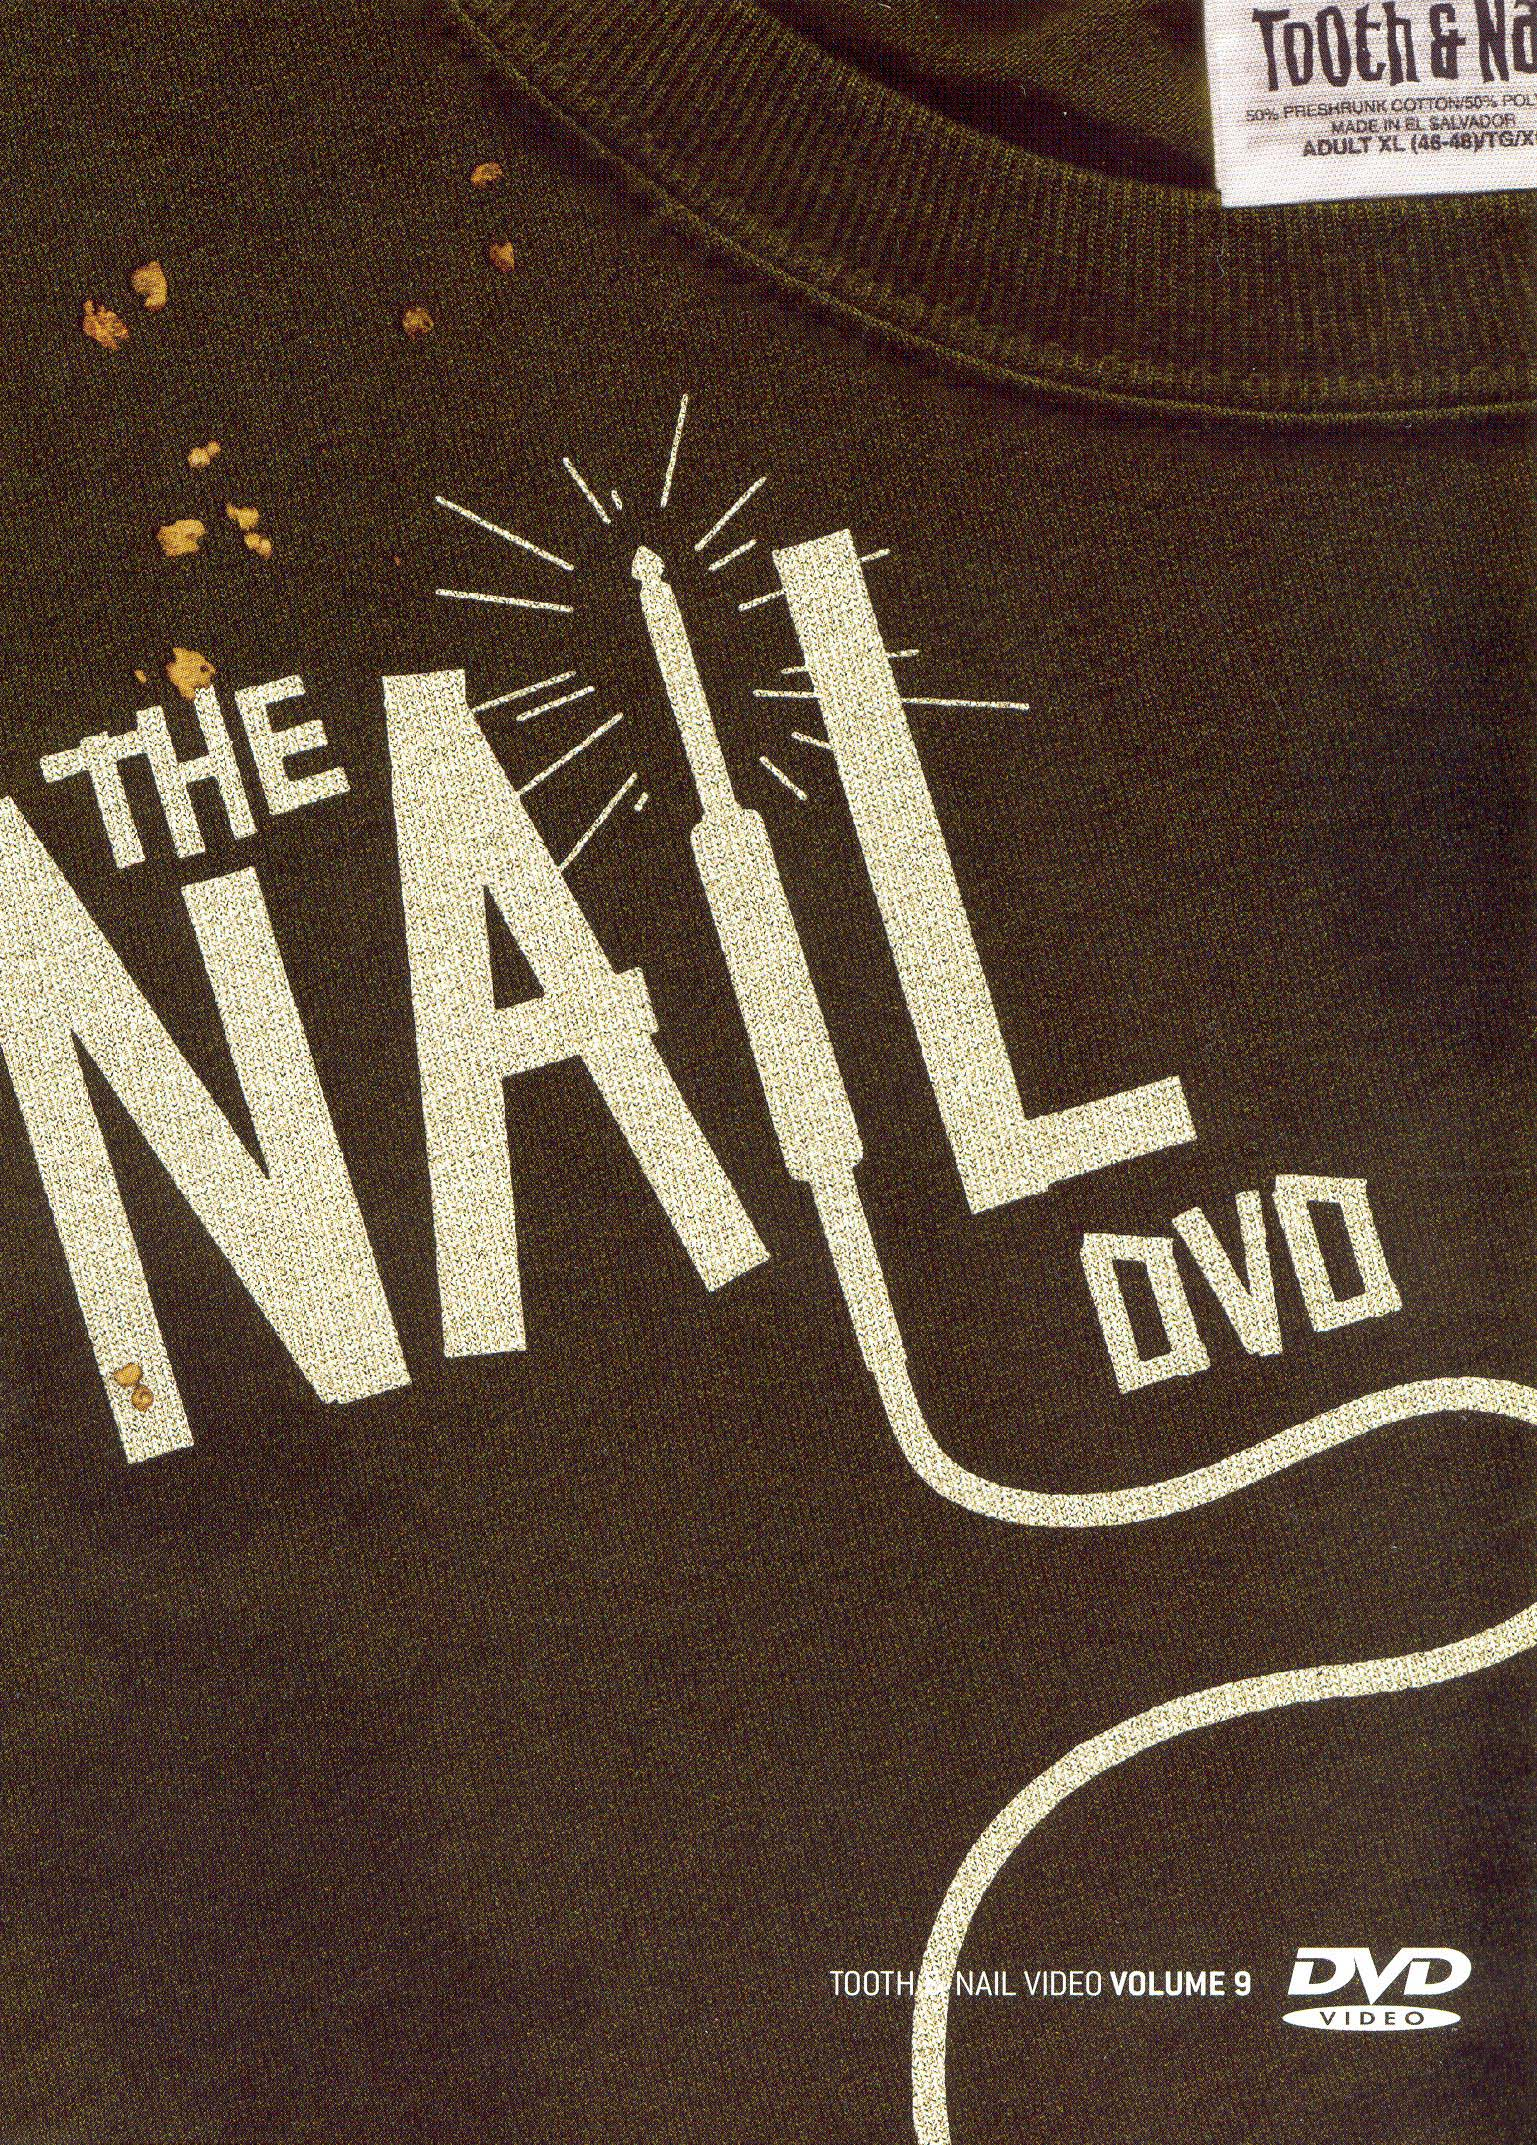 The Nail DVD: Tooth & Nail Video, Vol. 2